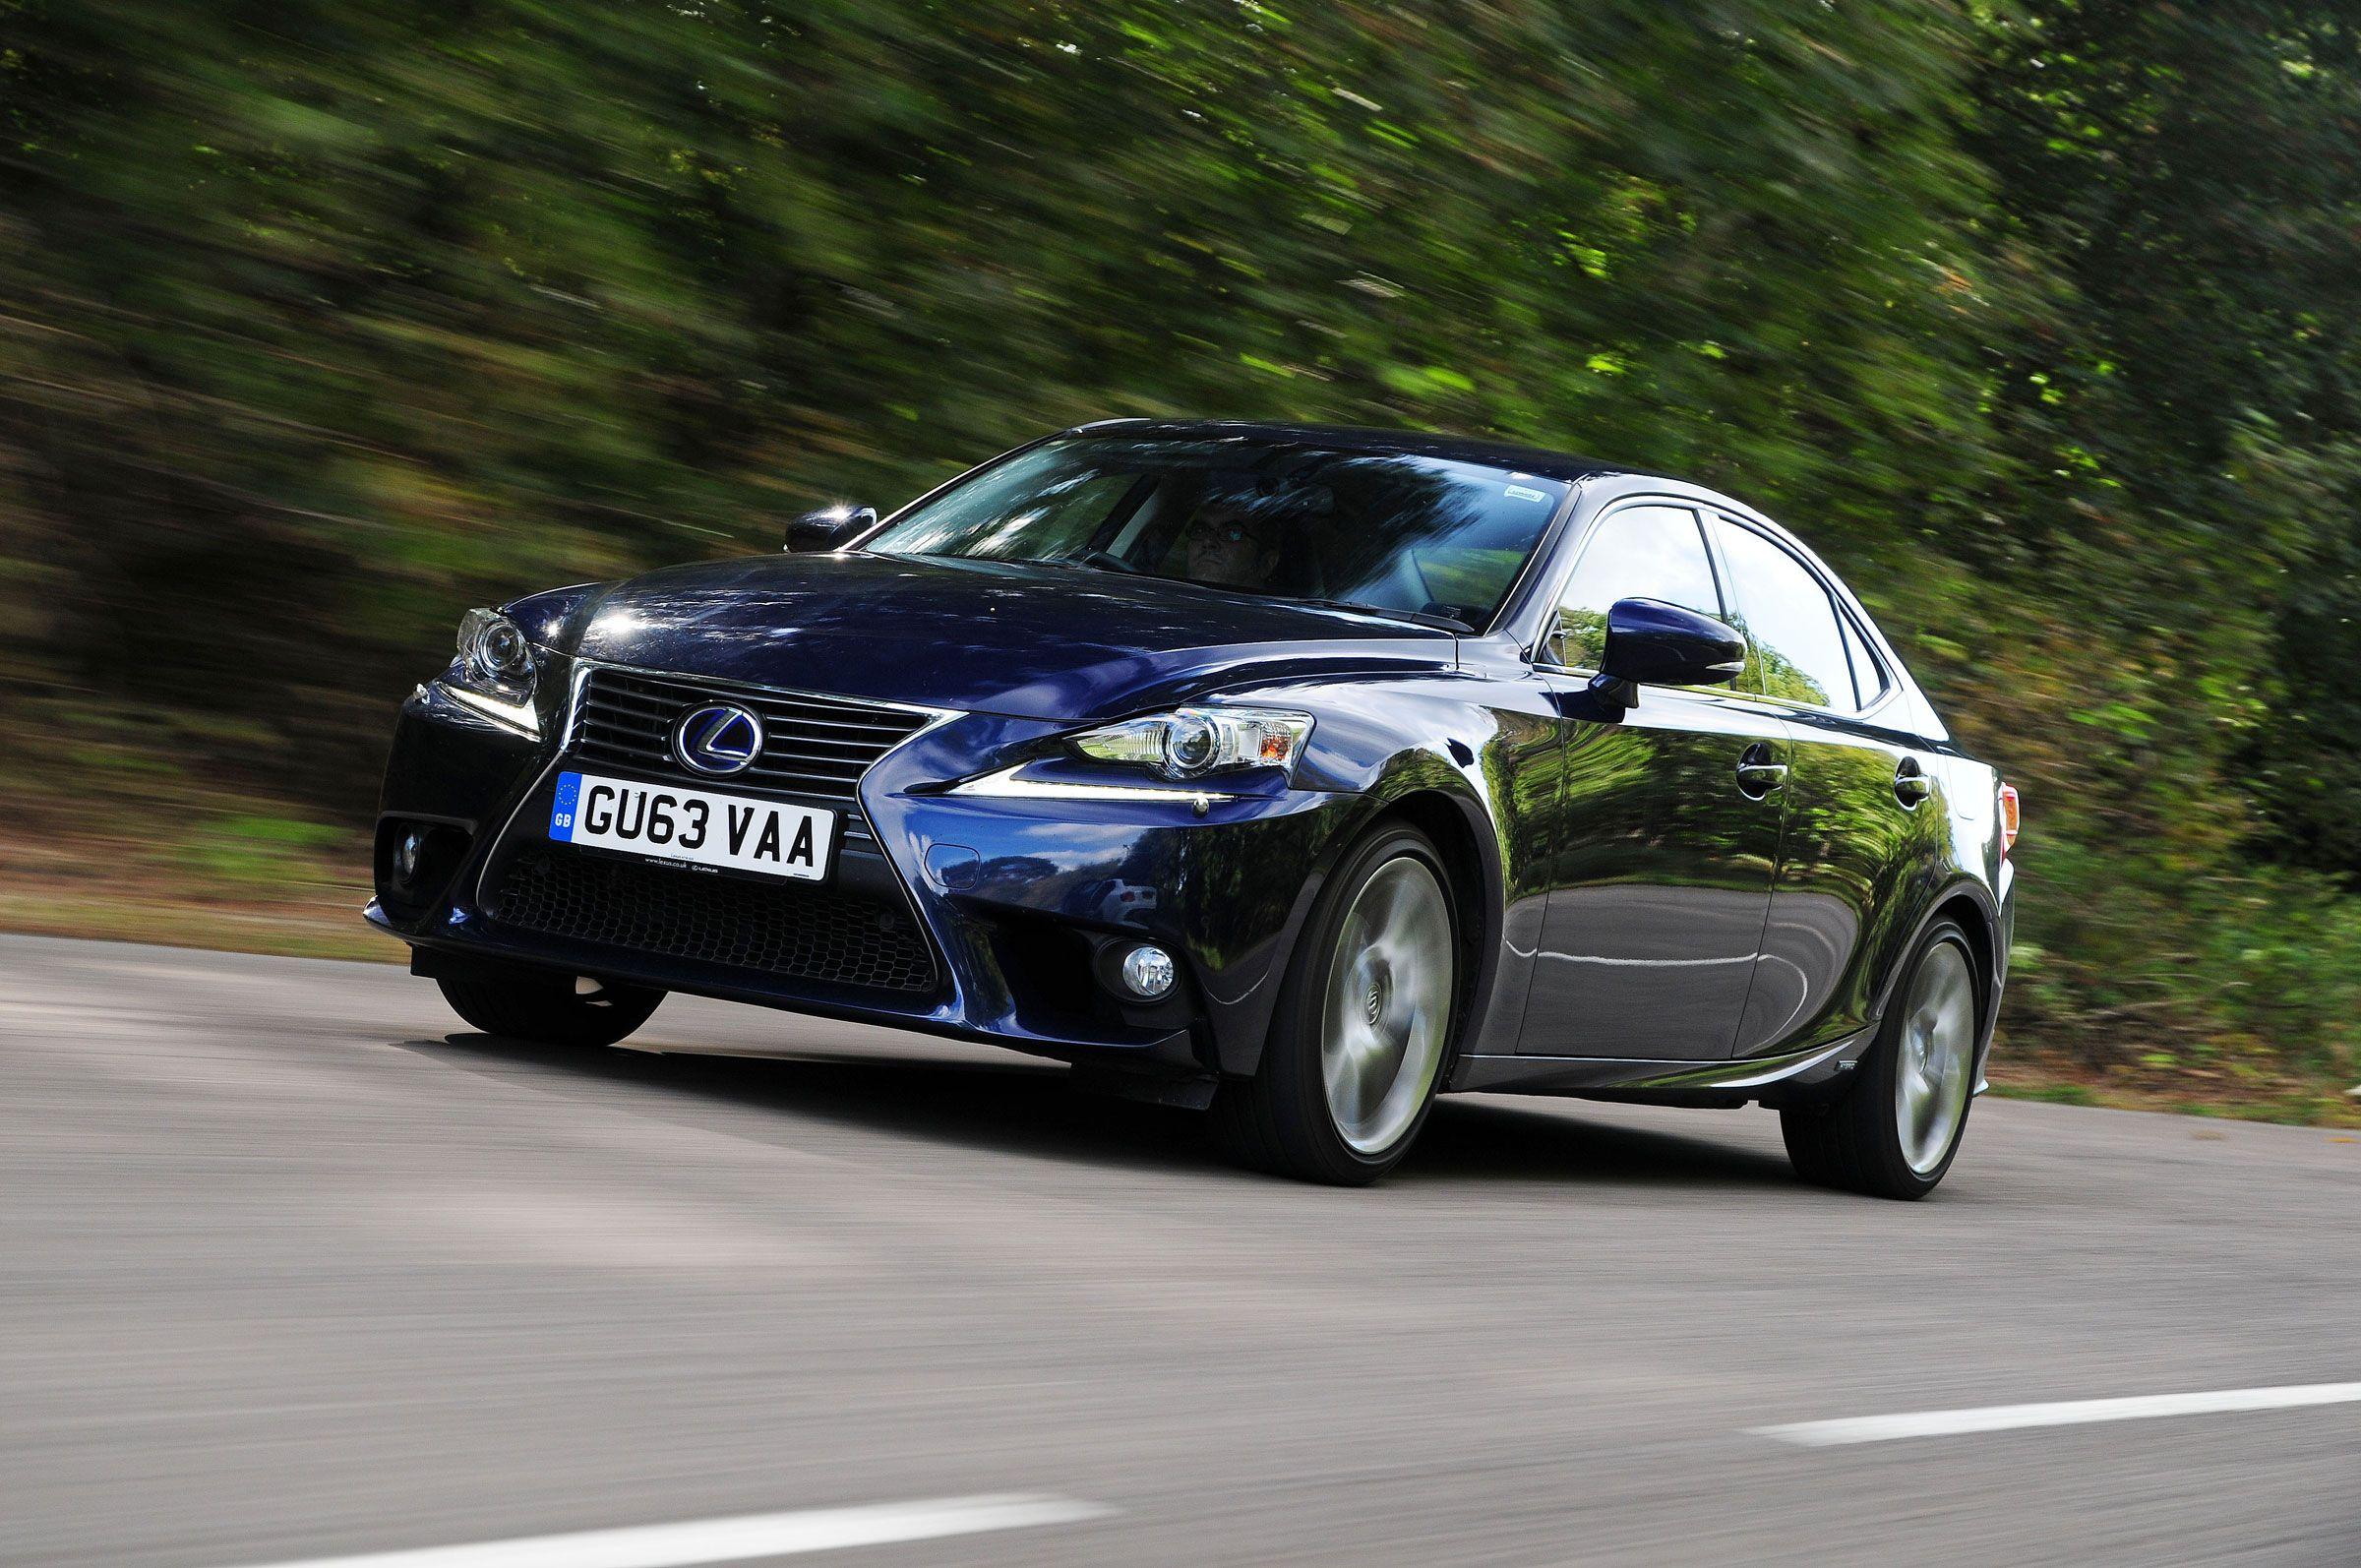 Lexus Is300h Best Hybrid Cars Best Hybrid Cars On Sale Automotive Car Best Hybrid Cars Hybrid Car